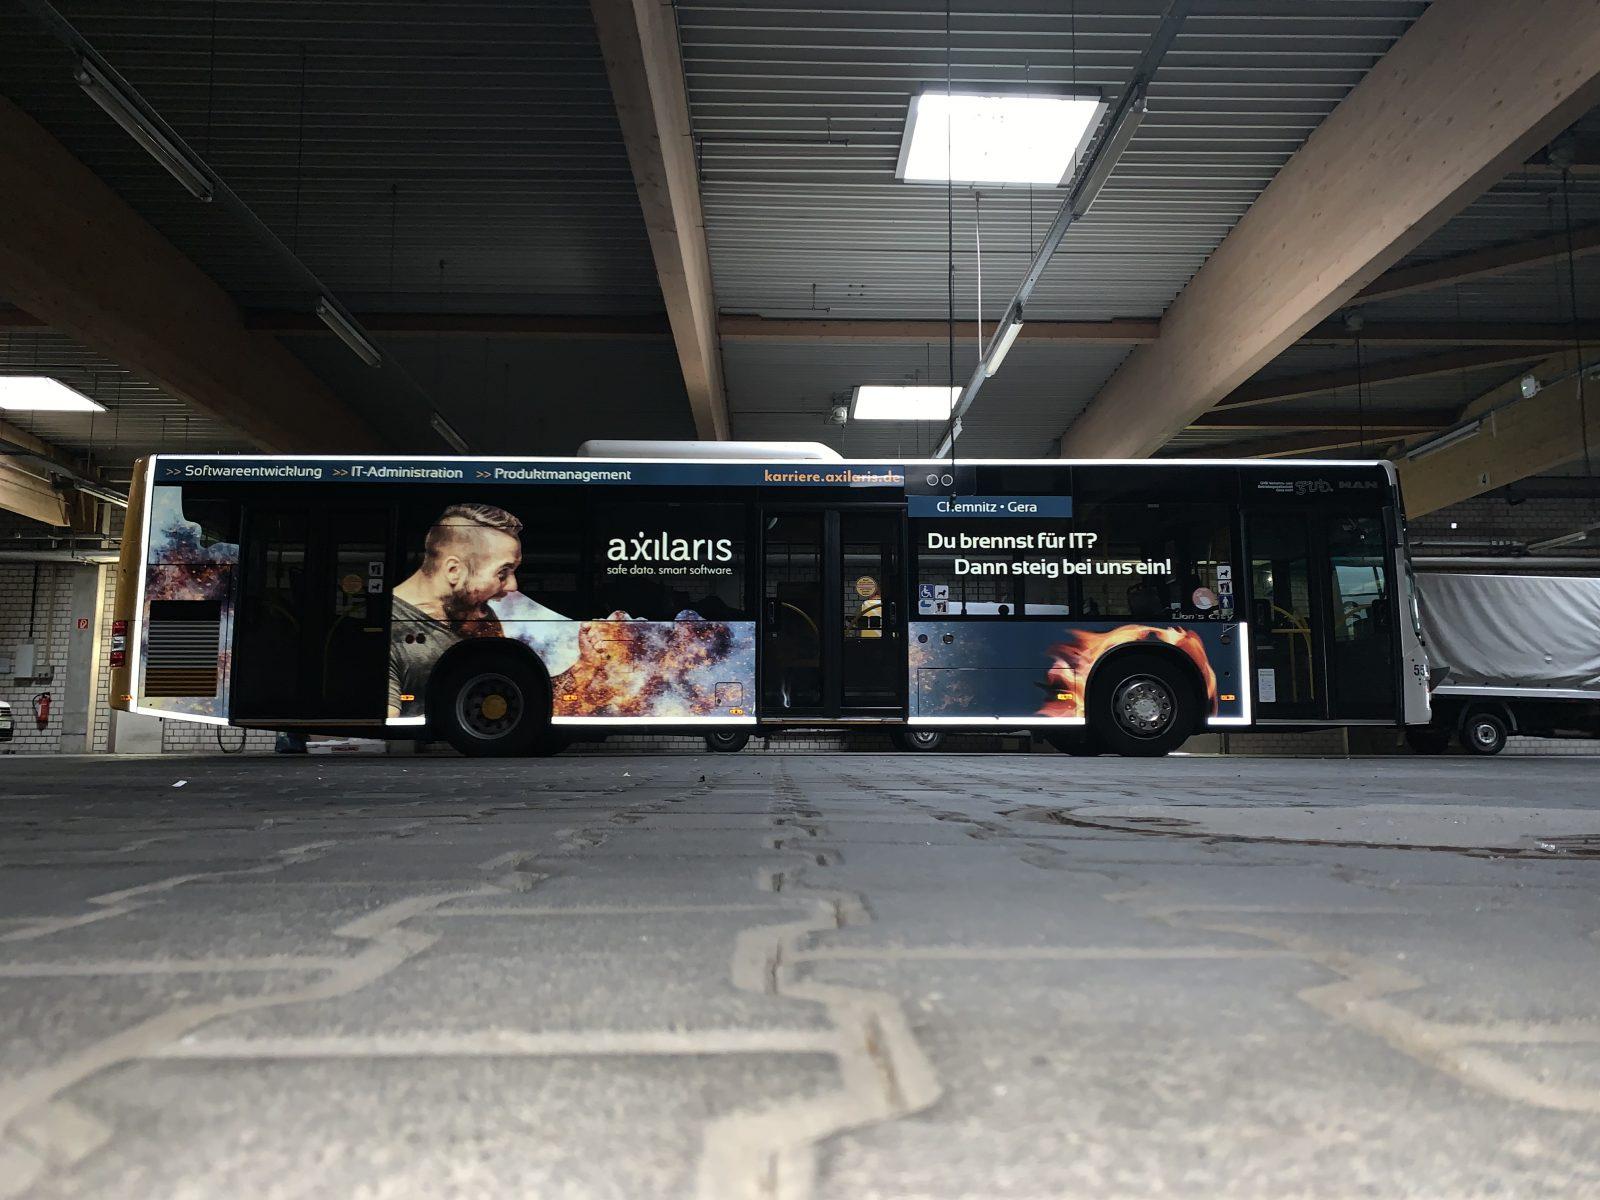 Personalgewinnung dank Buswerbung - Beispiel Axilaris